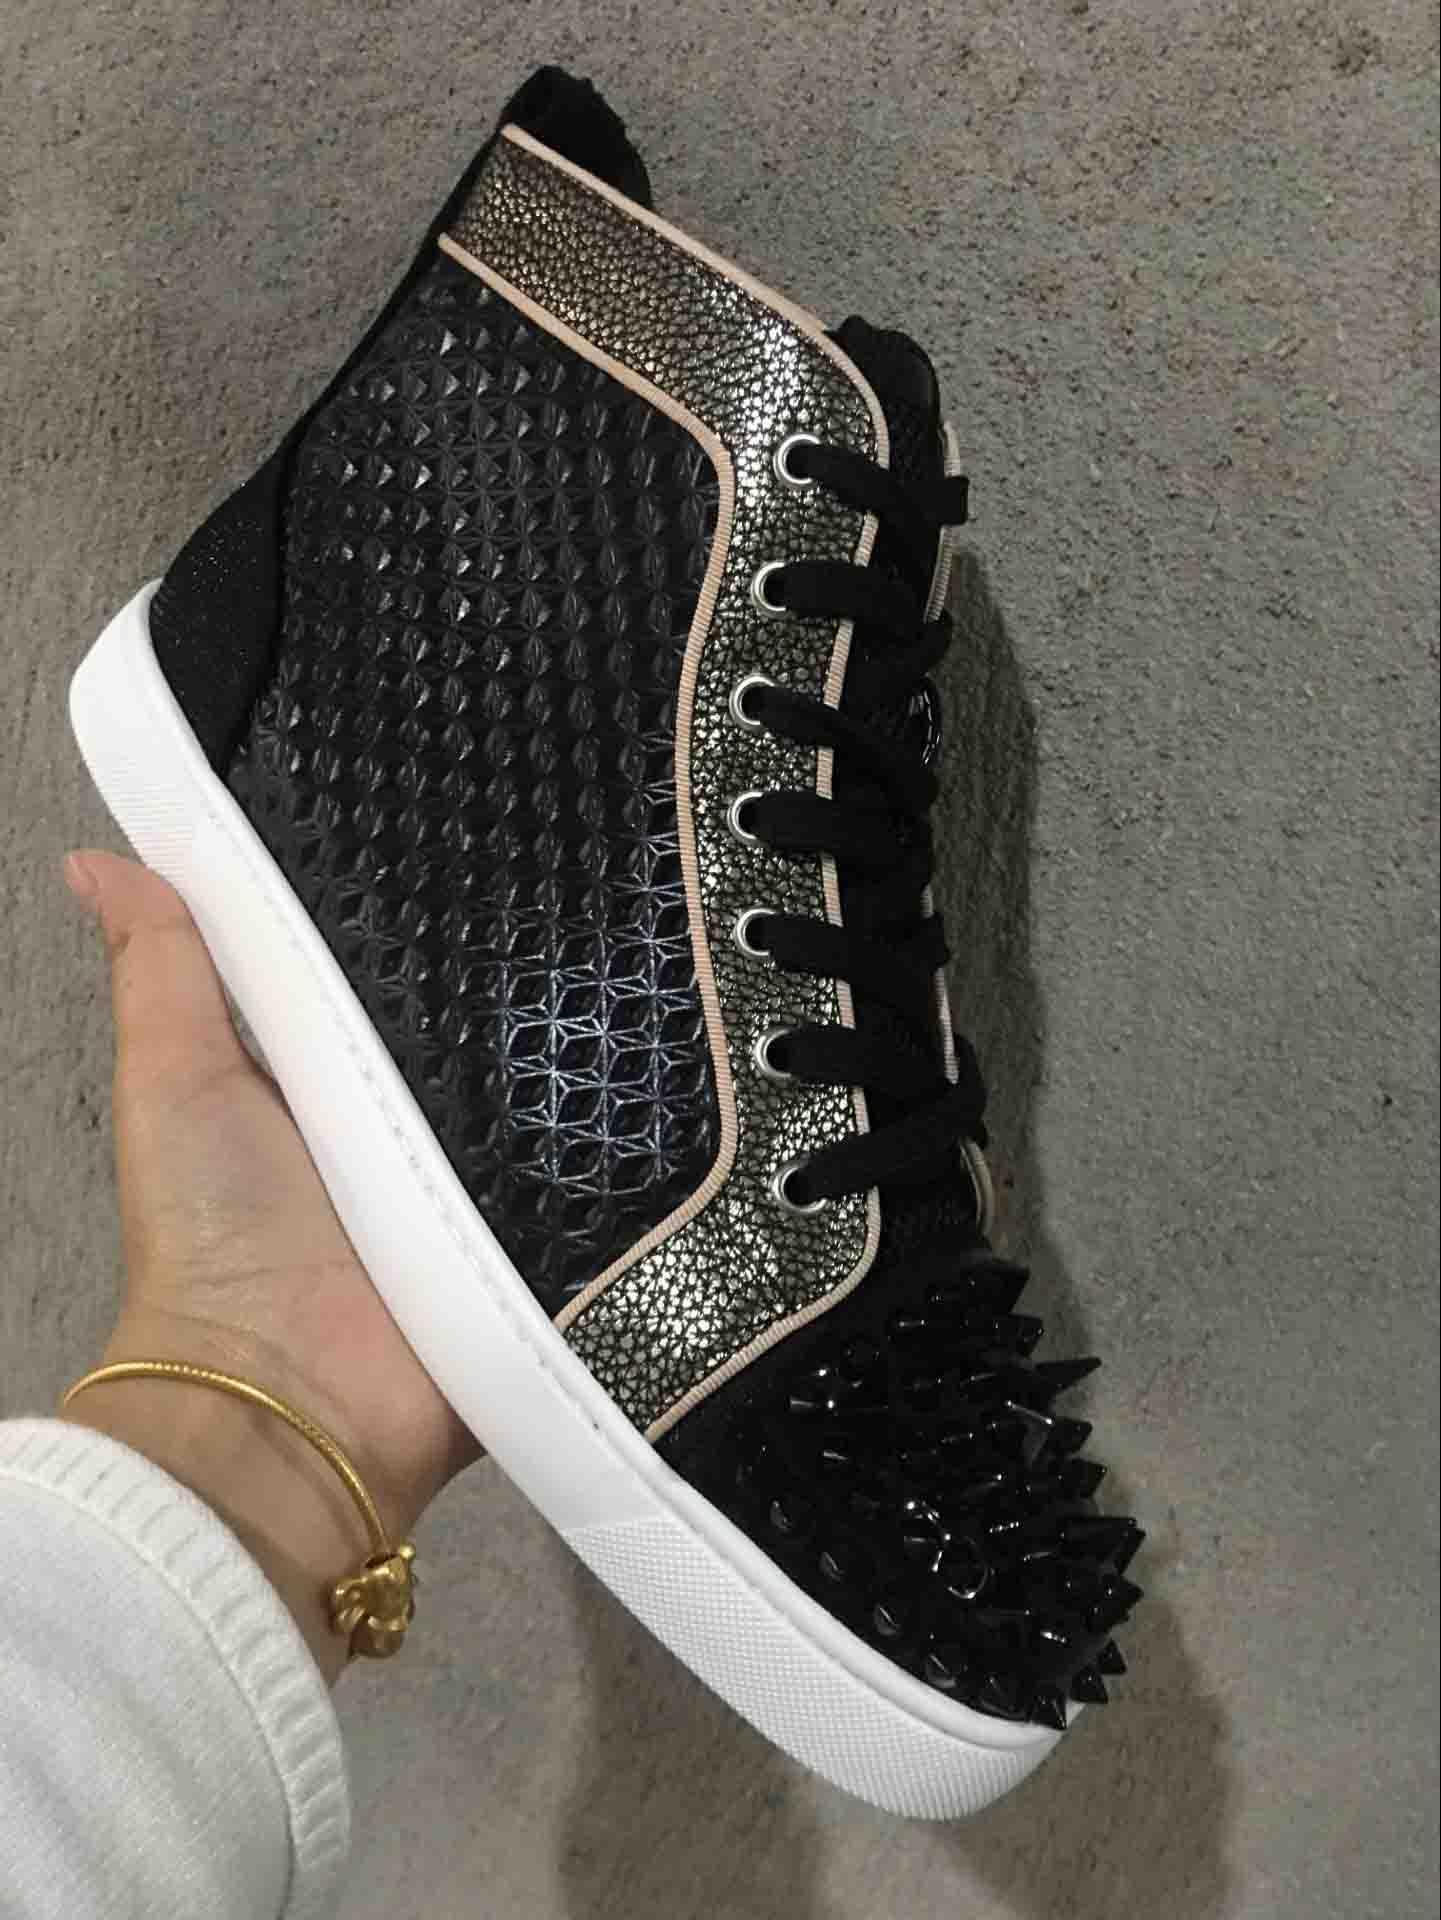 Christian Louboutin CL Luxus Designer Sneakers Männer Frauen Freizeitschuhe Party Kleid hochgeschnittene Spikes Plattformen Rote Bottom Trainer Schuhe Sneakers Männer TMJ